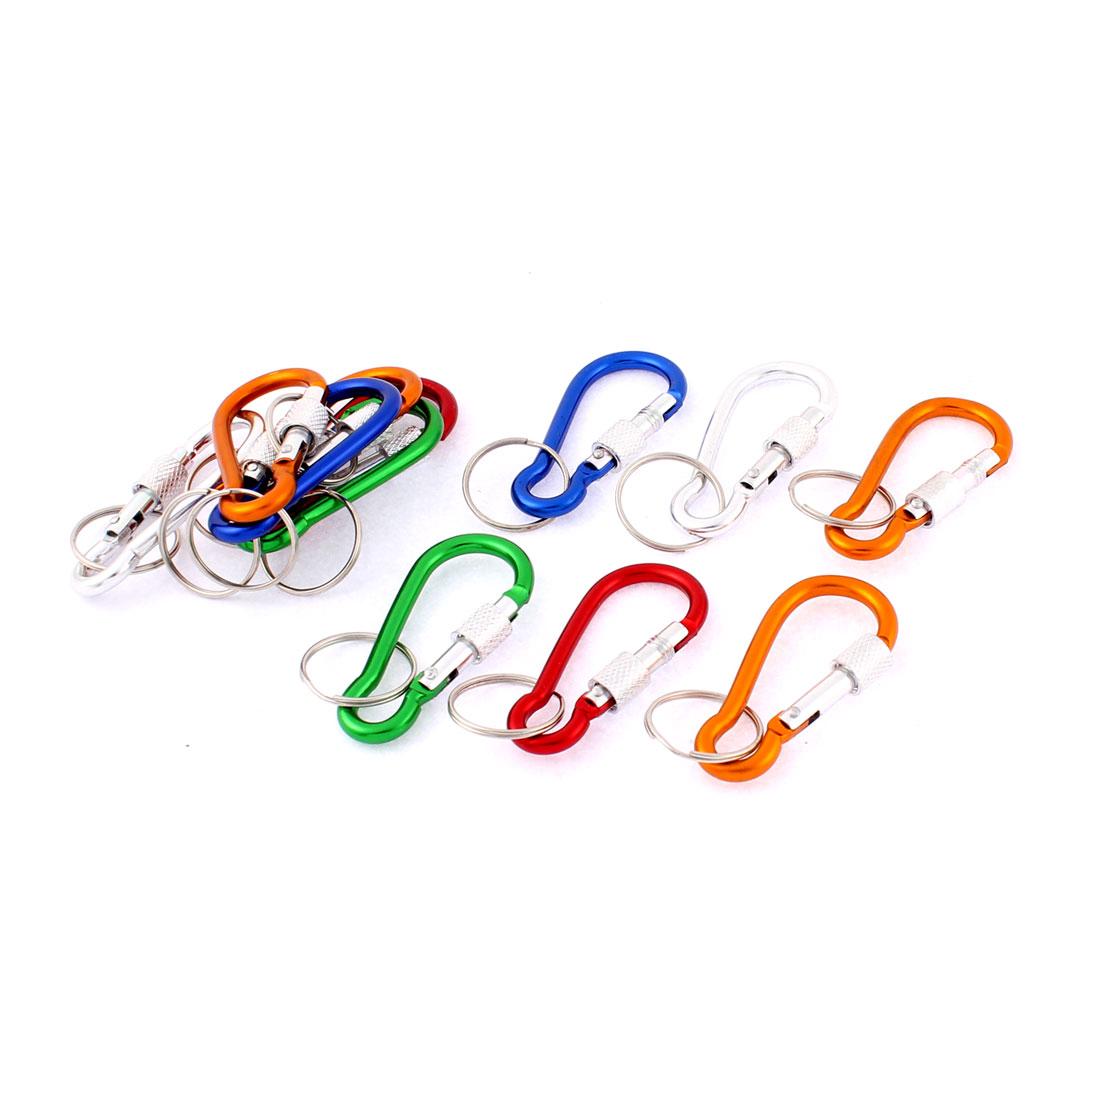 Spring Loaded Screw Locked Carabiner Clip Keychain Keyring Key Holder 12pcs